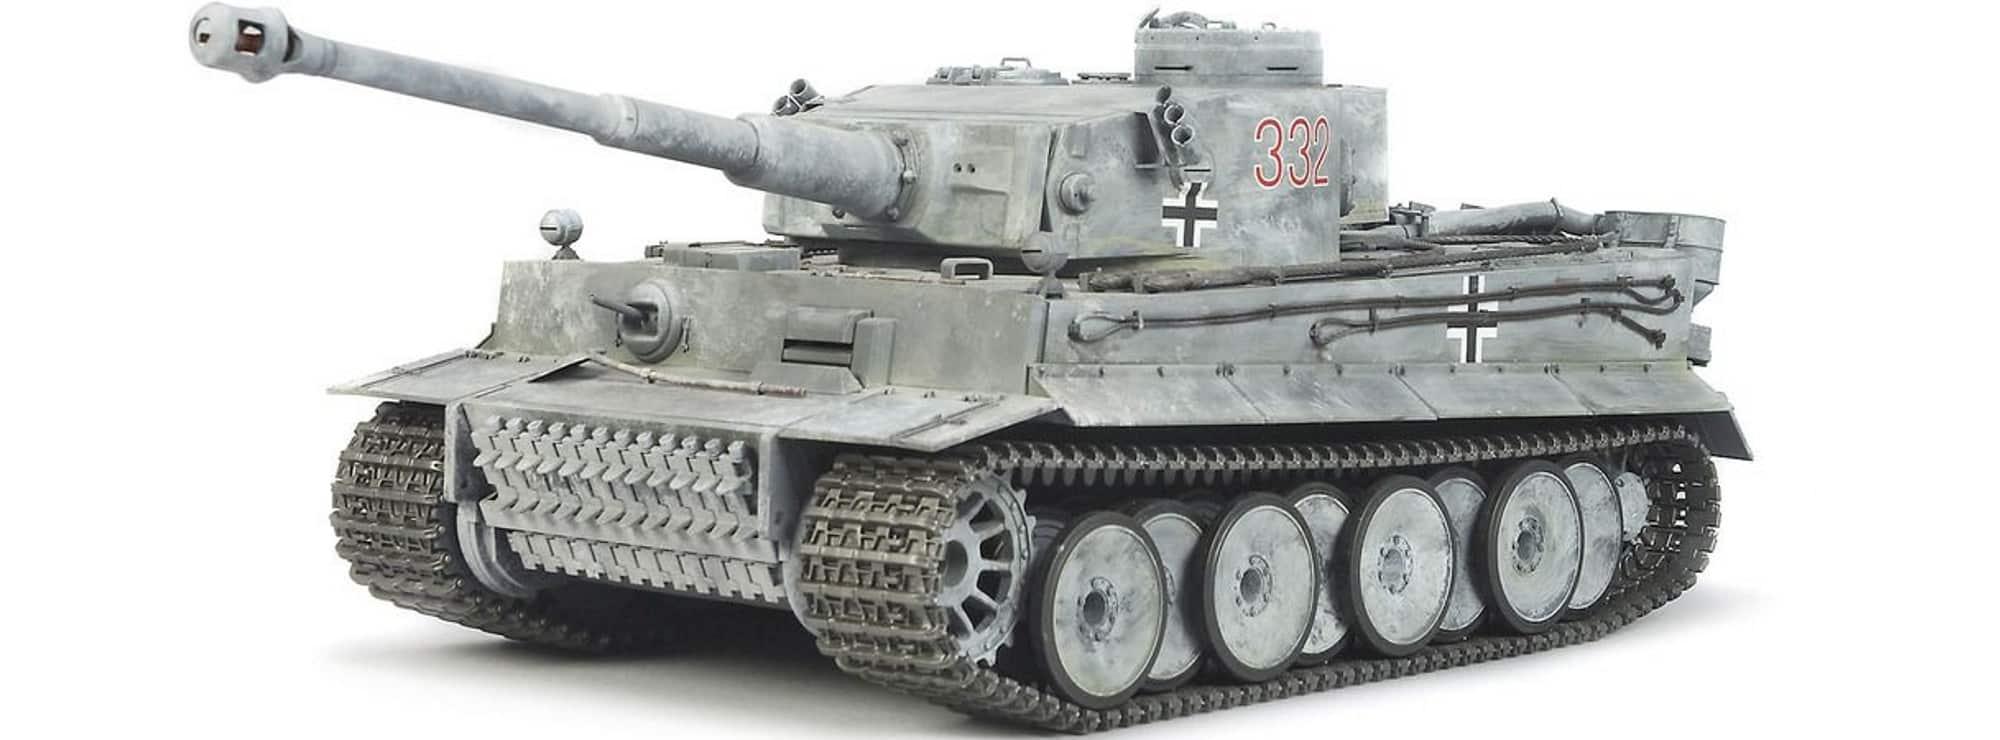 tamiya-56010-panzer-tiger-i-full-option-bausatz-1